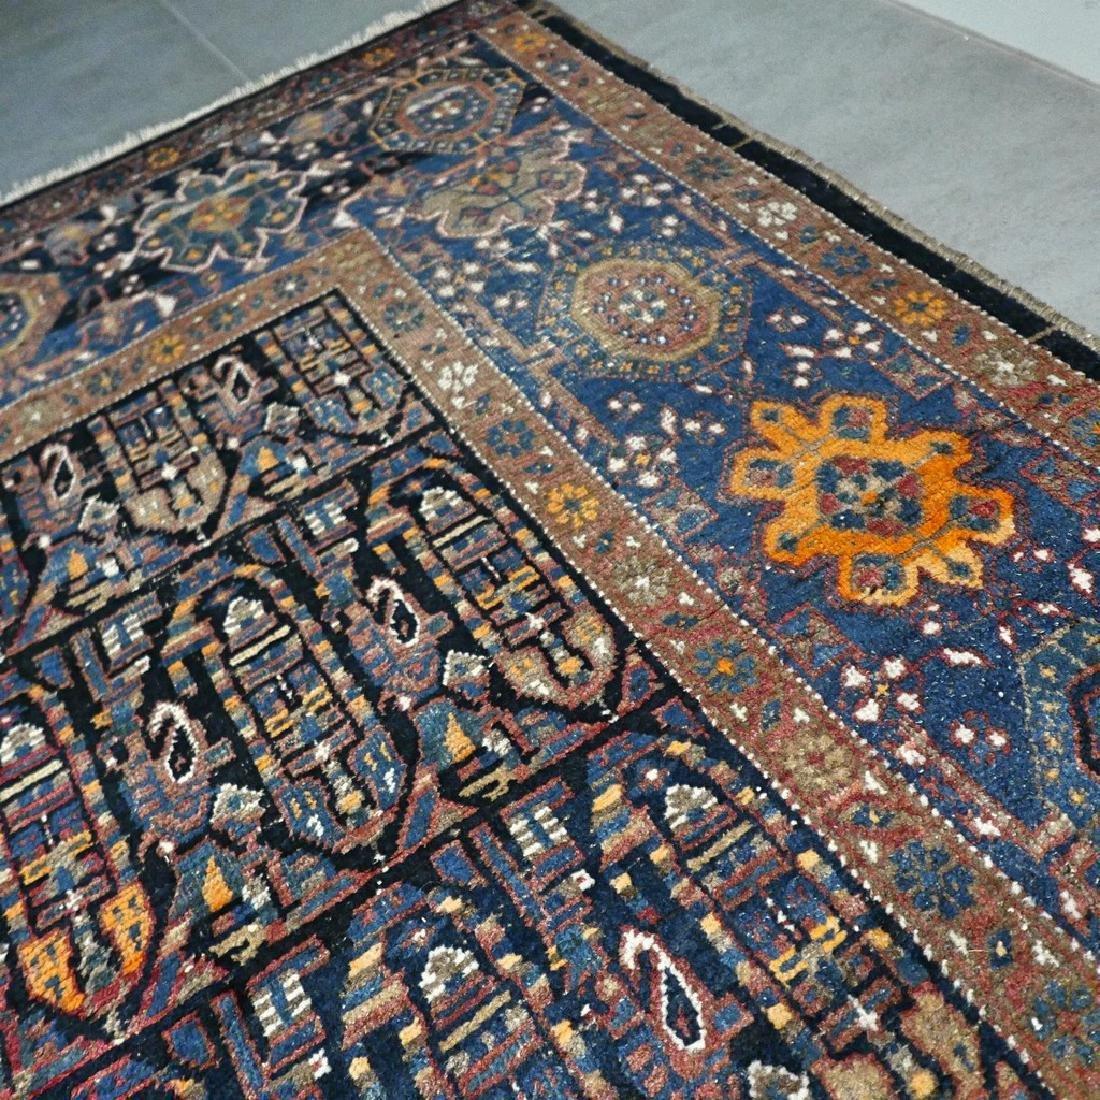 10.1x4.3 Antique Armenian boteh Kazak rug - 1880s - - 9